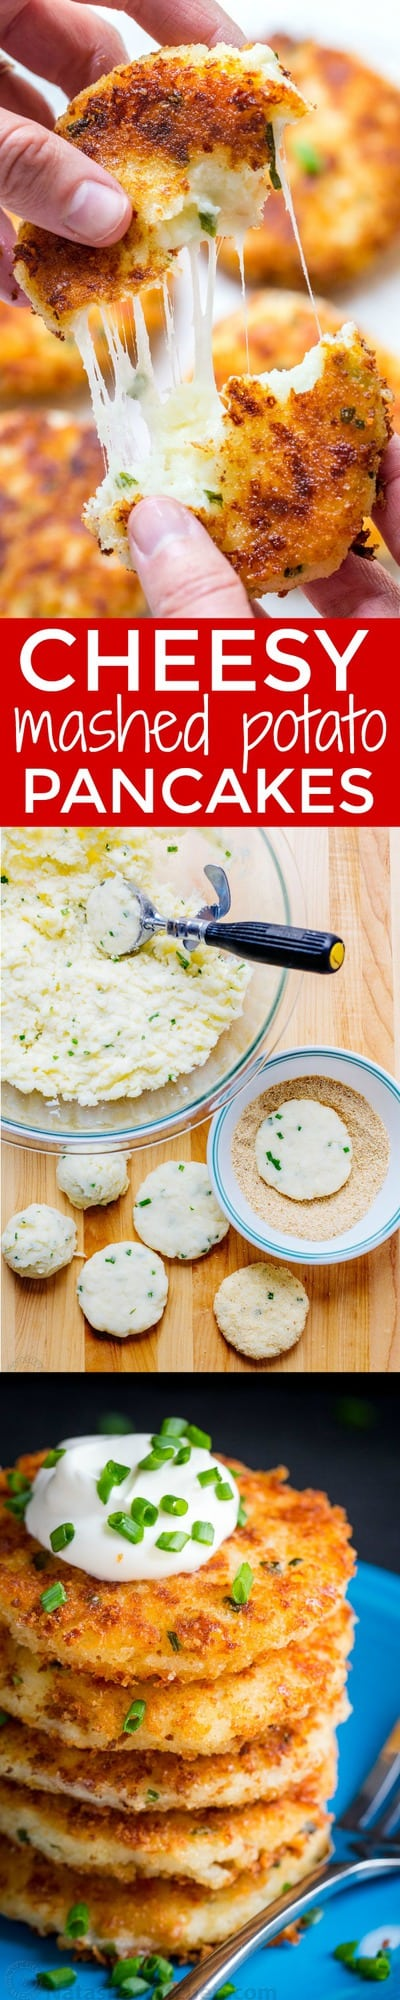 Mashed potato pancakes recipes